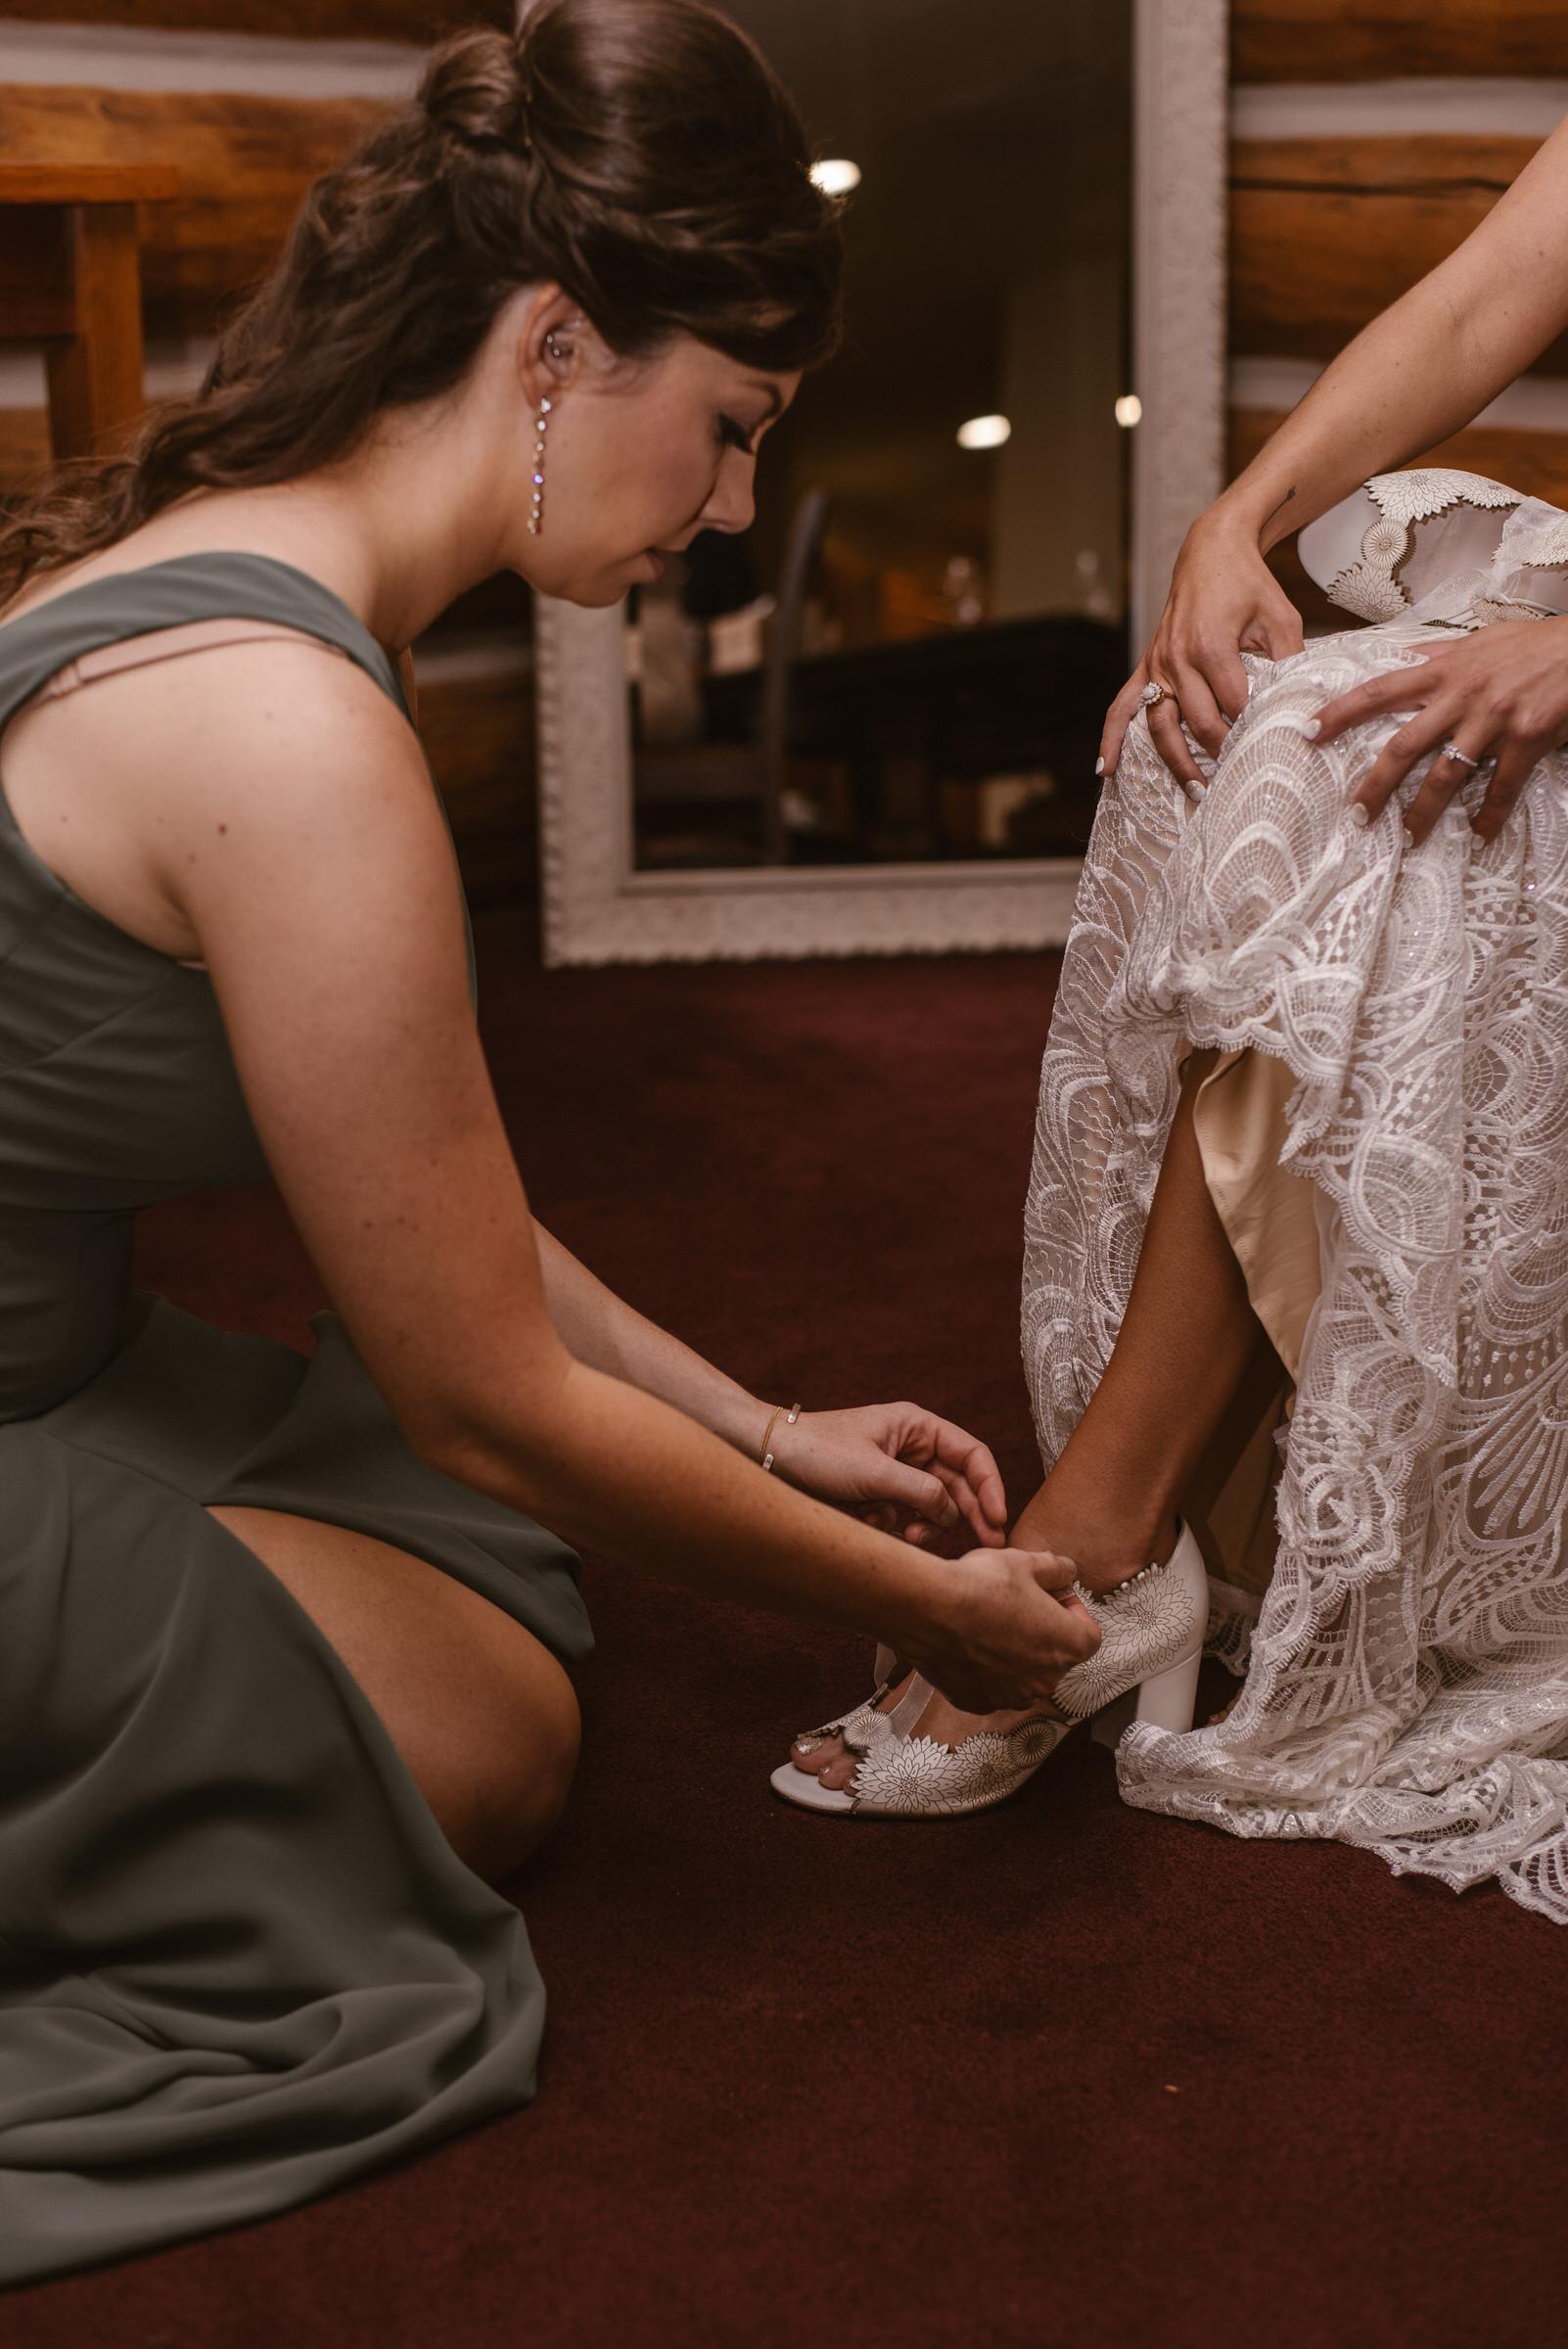 Wilderness-Ridge-Lincoln-Nebraska-Wedding-Kaylie-Sirek-Photography-022.jpg